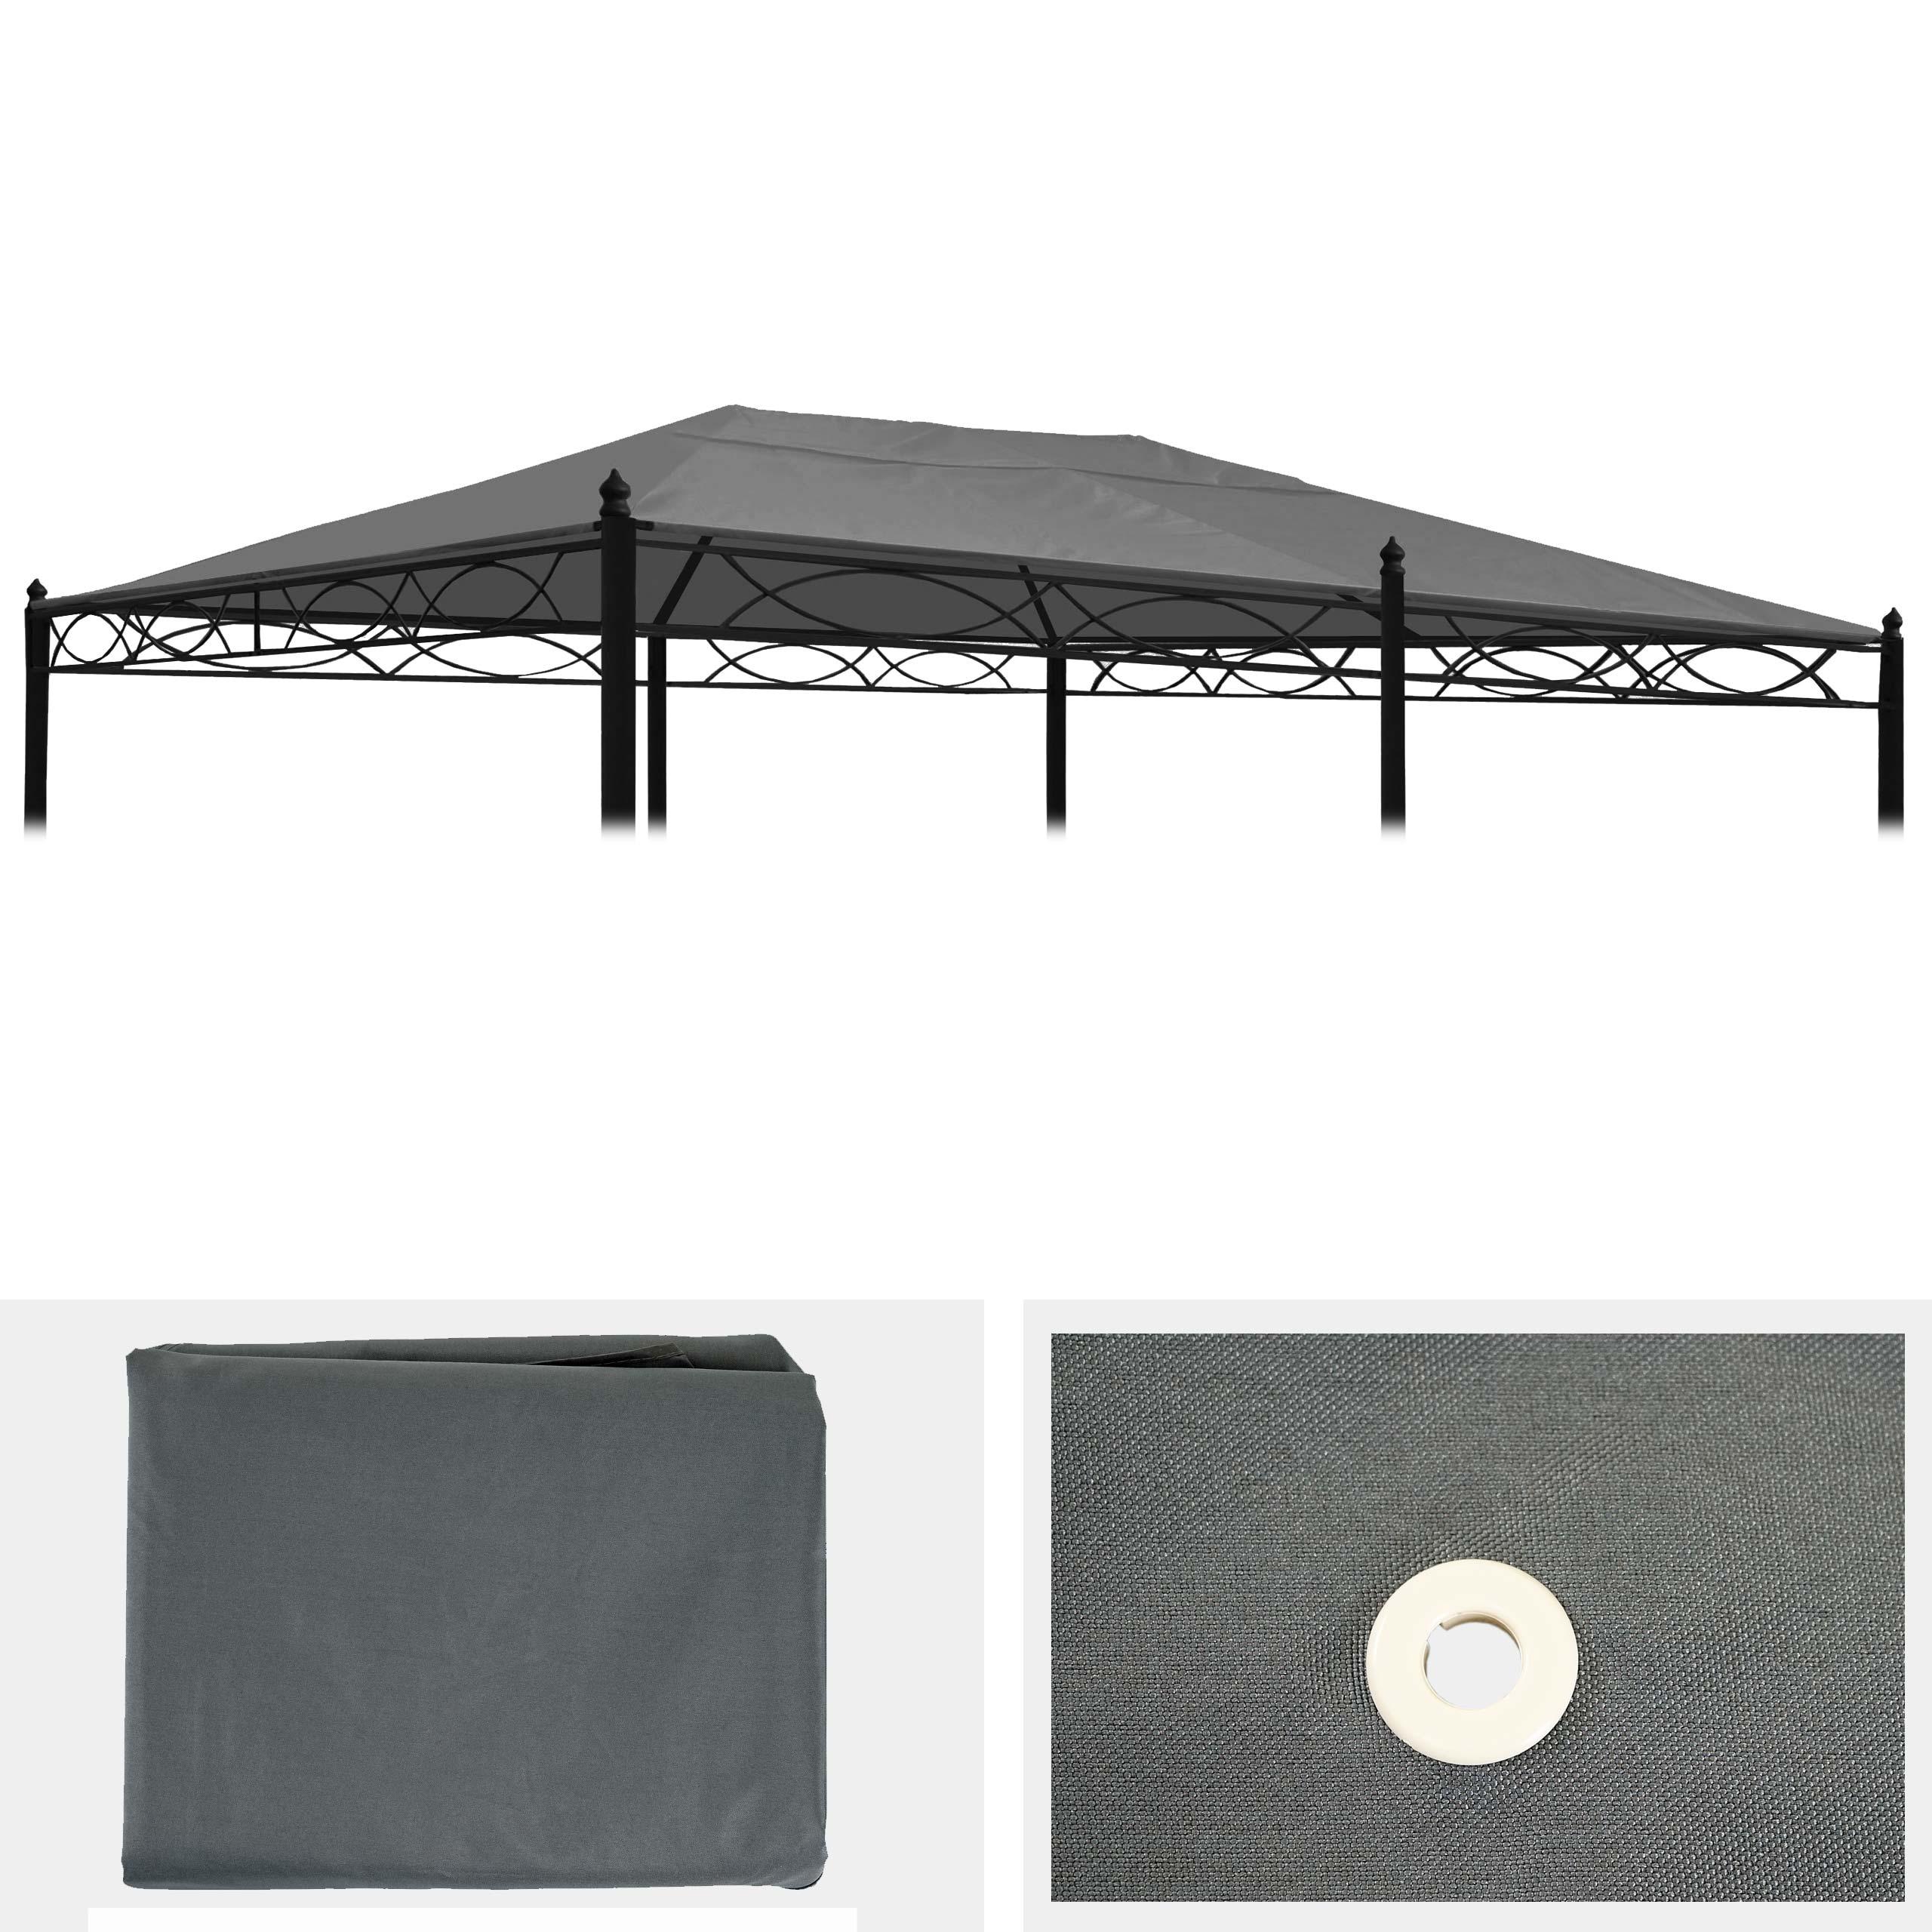 ersatzbezug f r dach pergola pavillon cadiz 5x3m grau. Black Bedroom Furniture Sets. Home Design Ideas